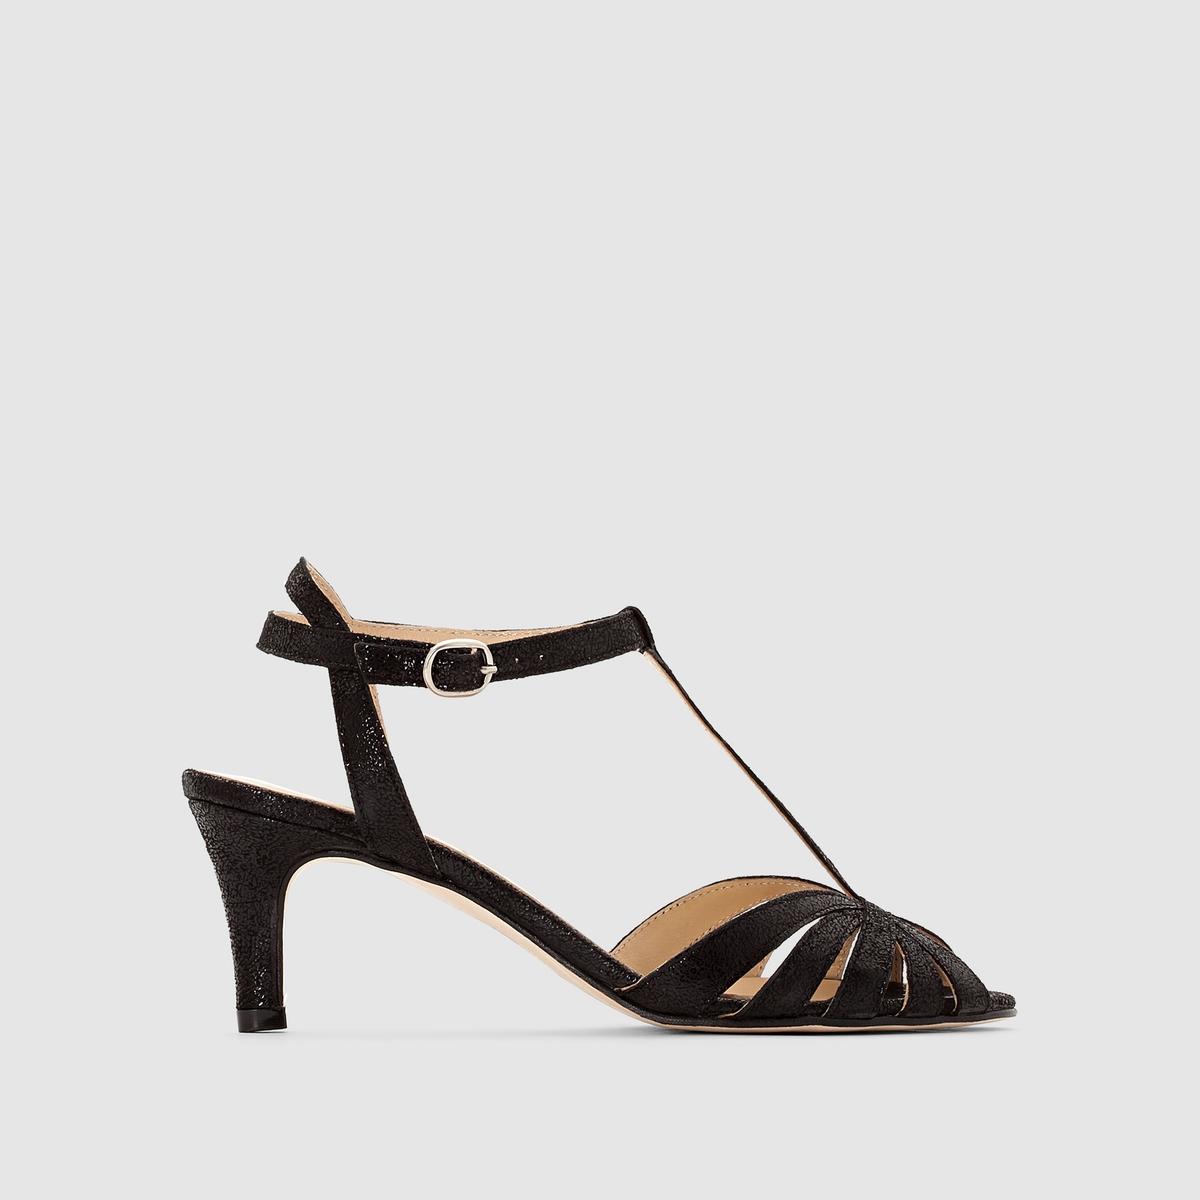 Босоножки кожаные на каблуках, Doliate цены онлайн